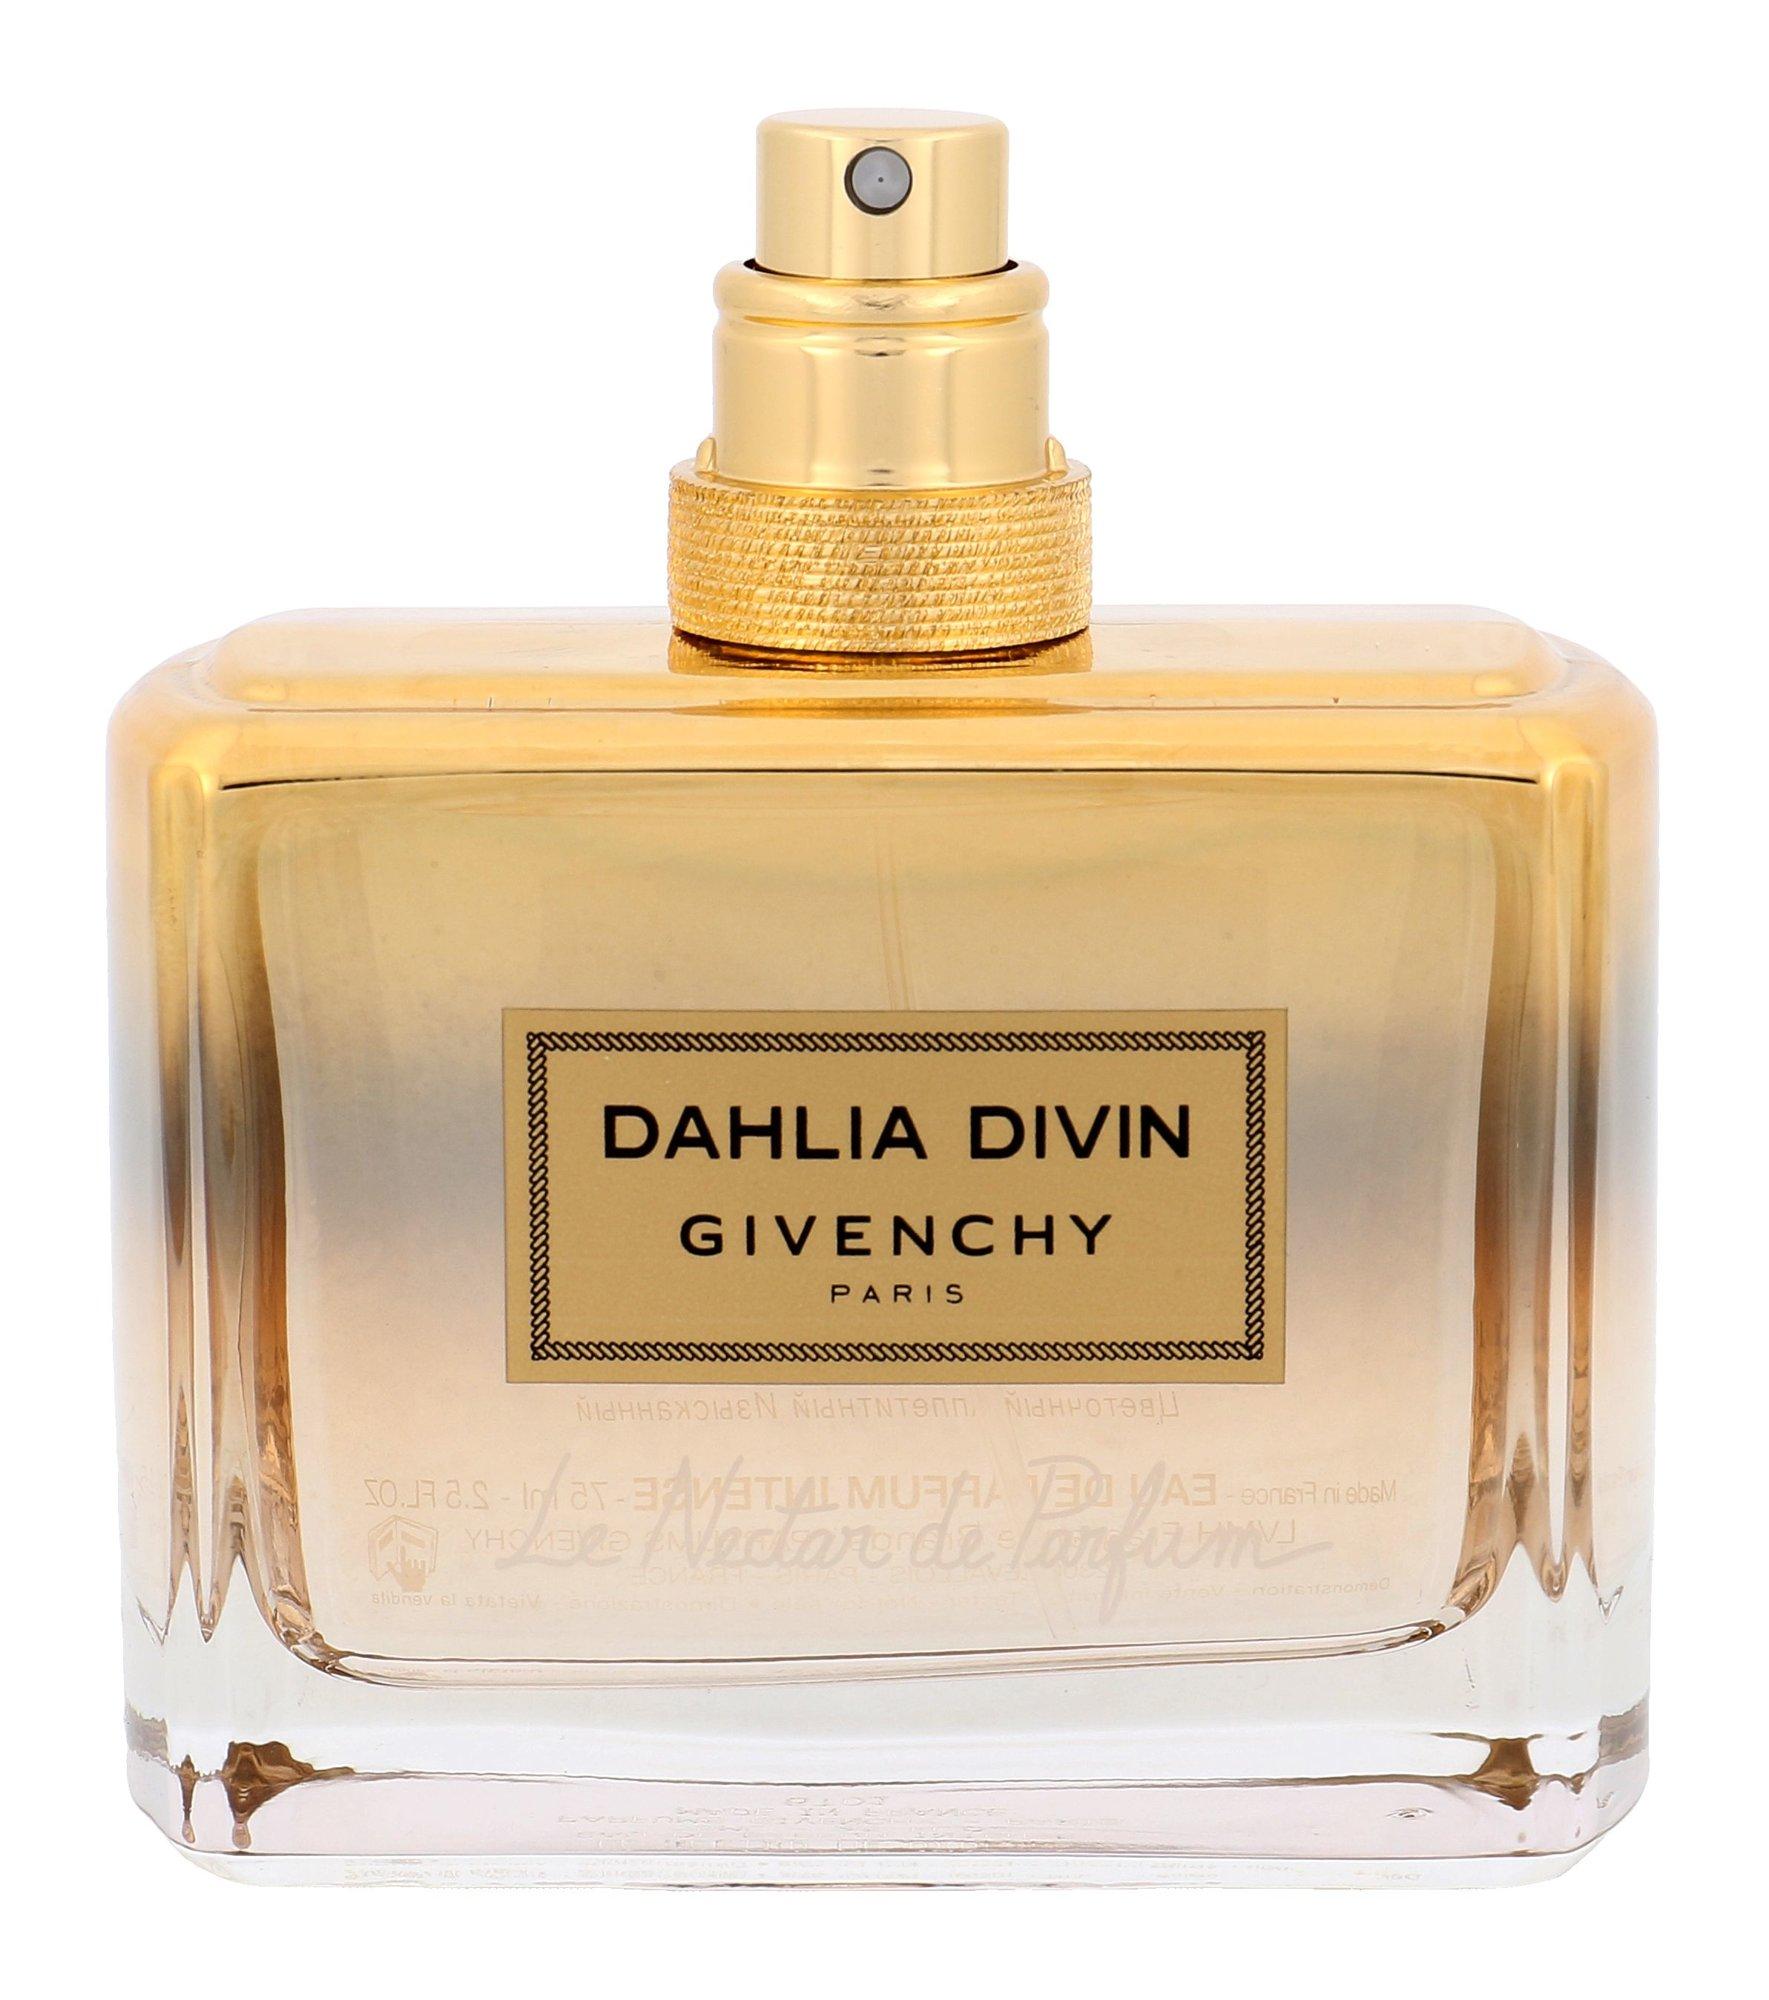 Givenchy Dahlia Divin Le Nectar de Parfum EDP 75ml